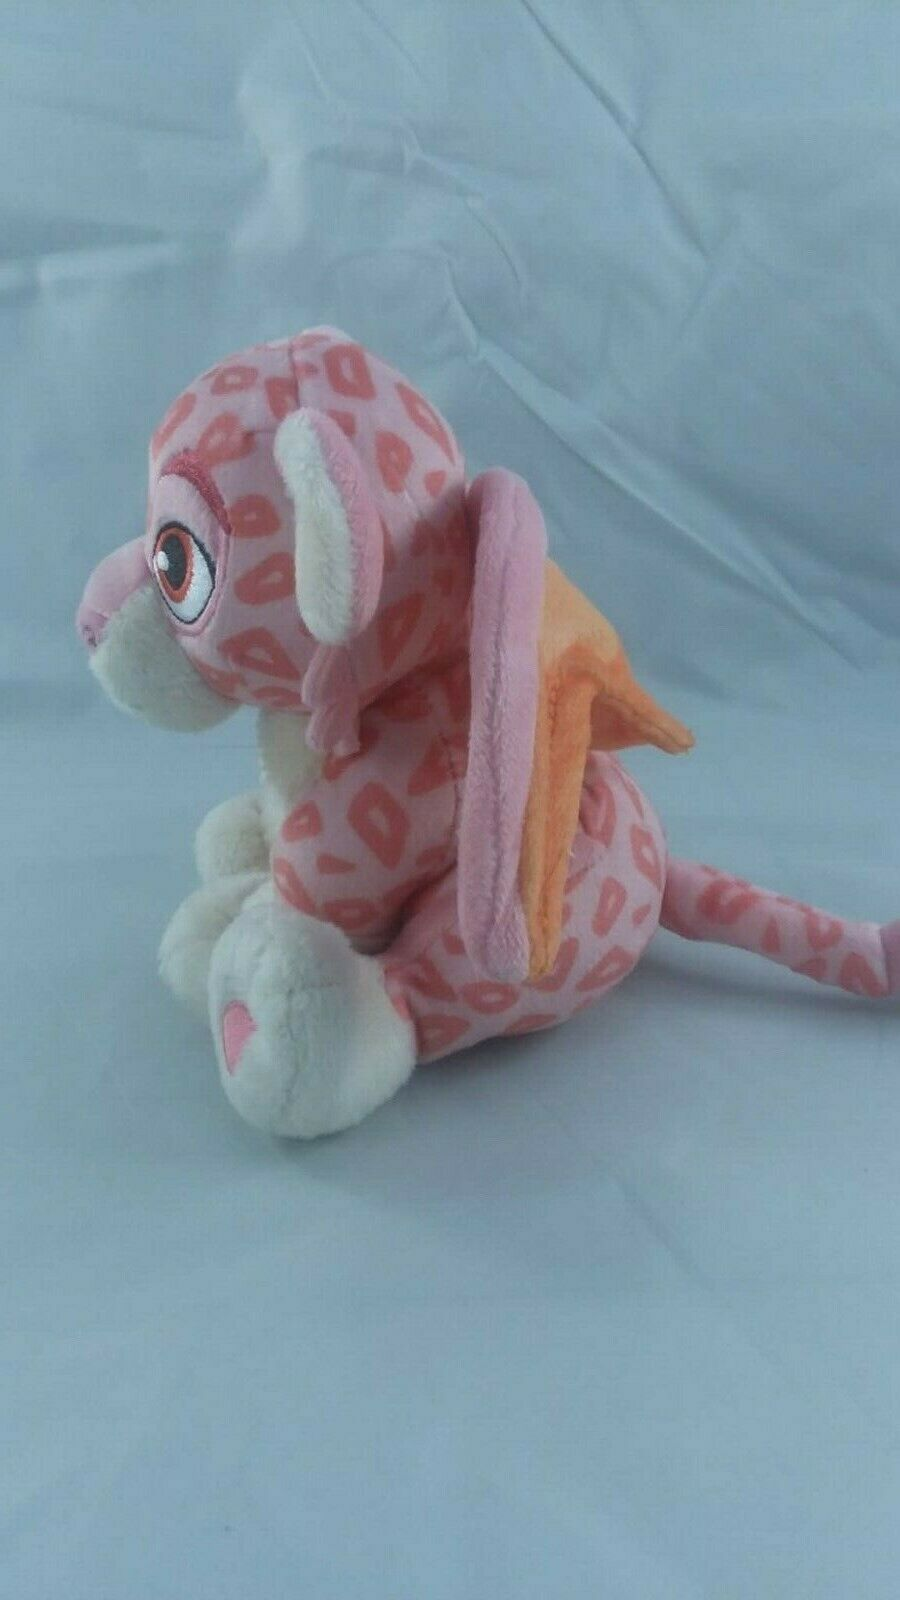 "Disney Store Authentic Elena of Avalor Flying Jaquin Plush Toy Doll 6"" EUC"